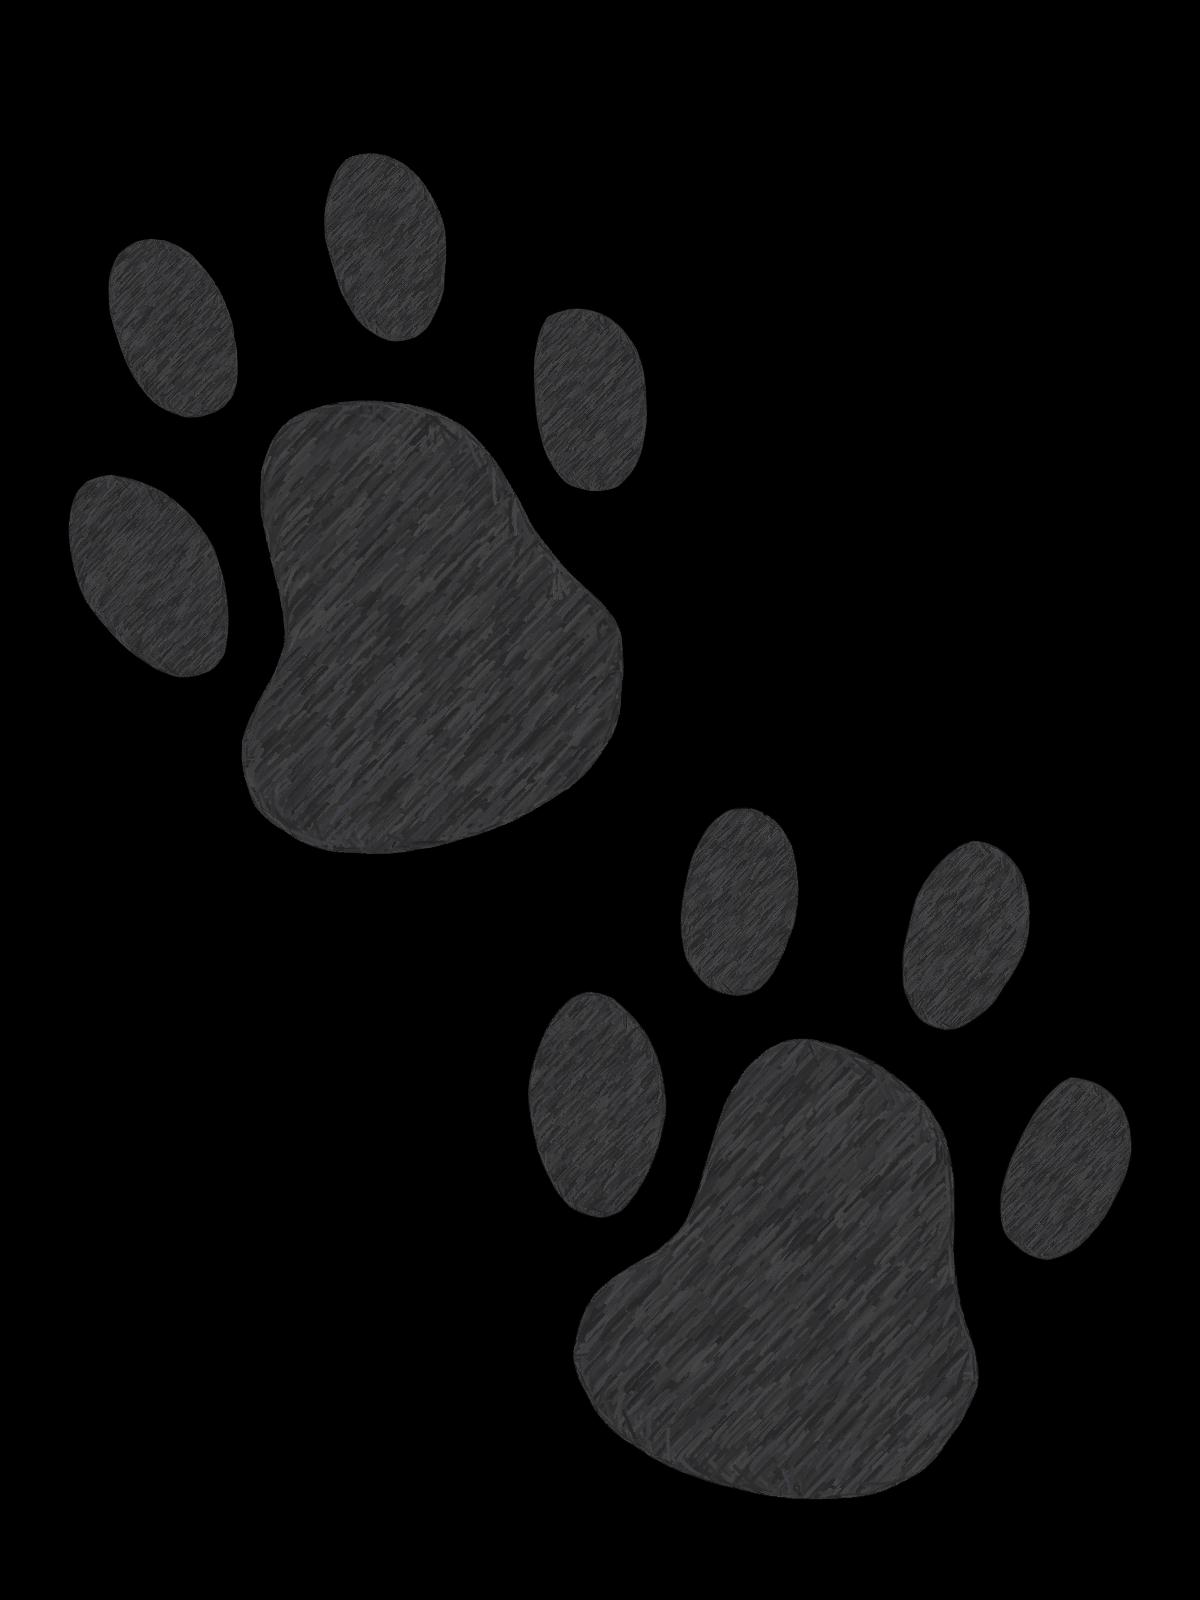 1200x1600 Paw Print Clip Art Ideas On Dog Paw Prints 4